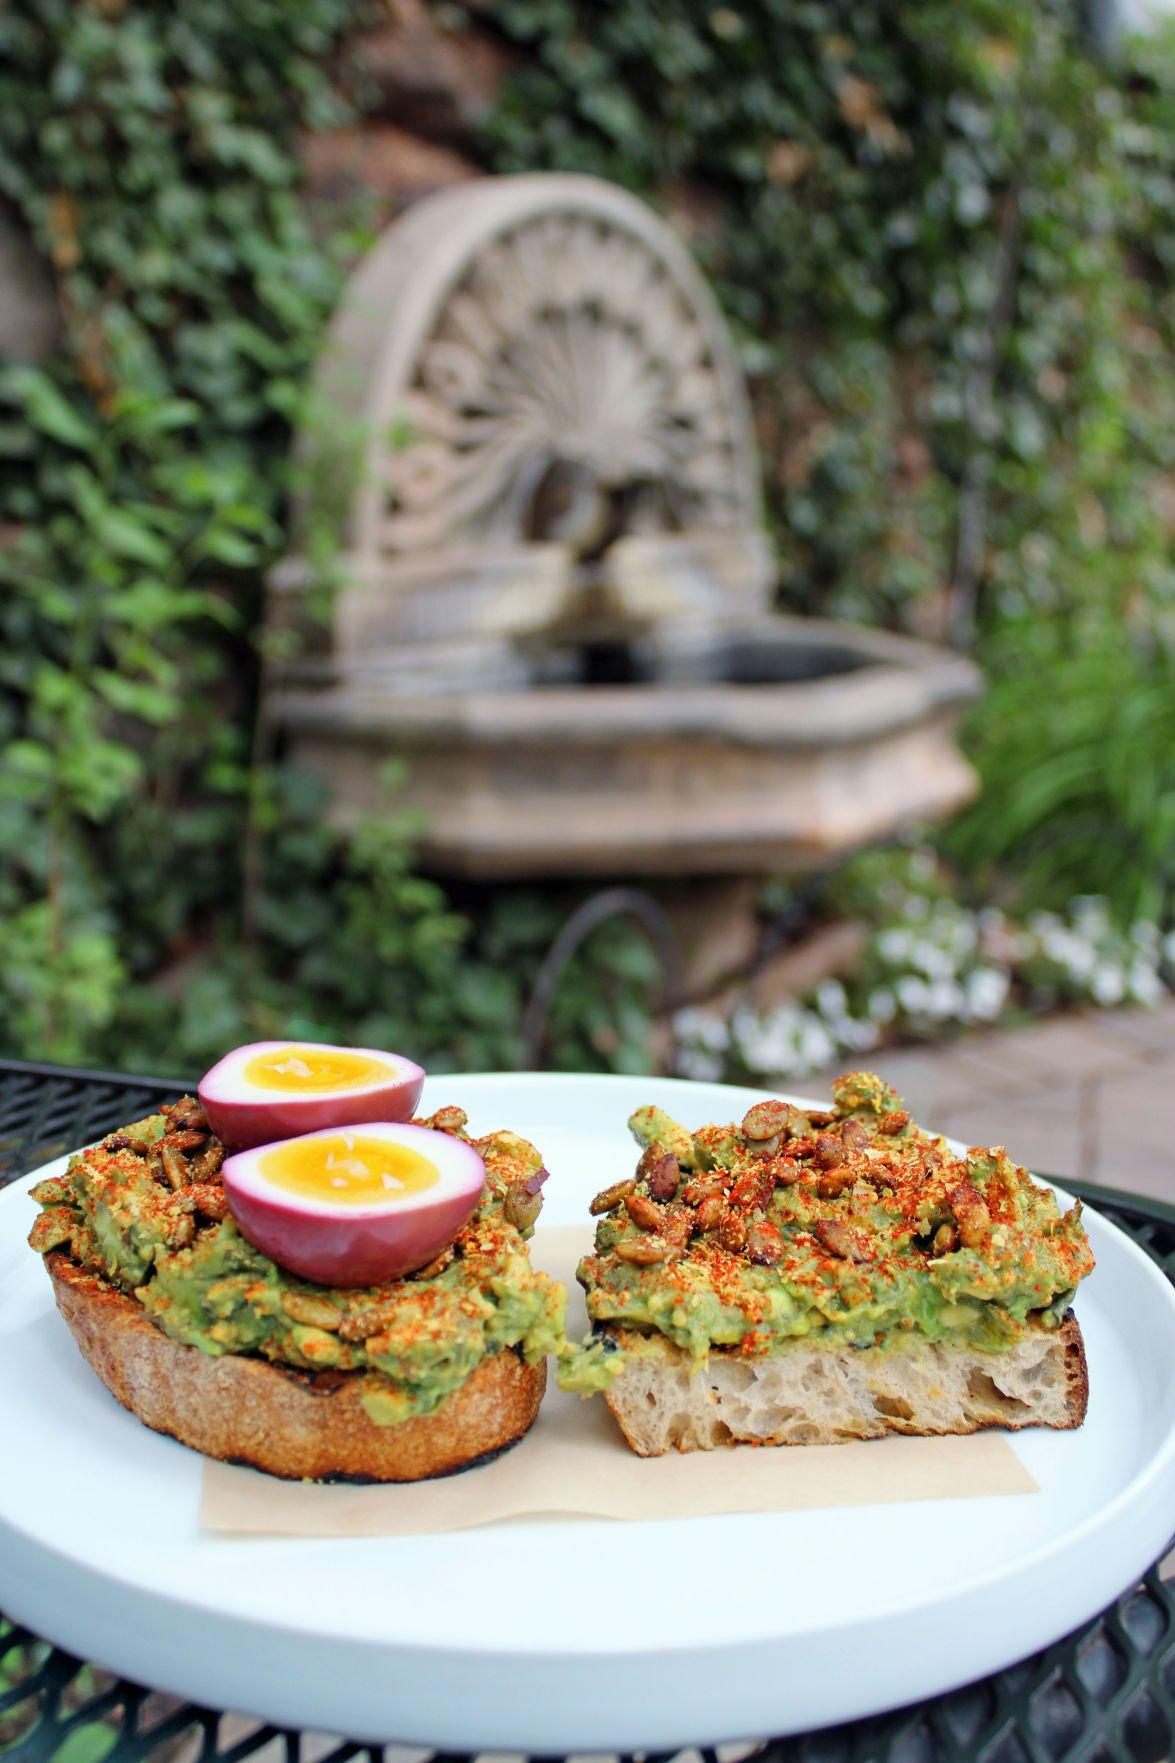 Avocado toast at Indian Gardens